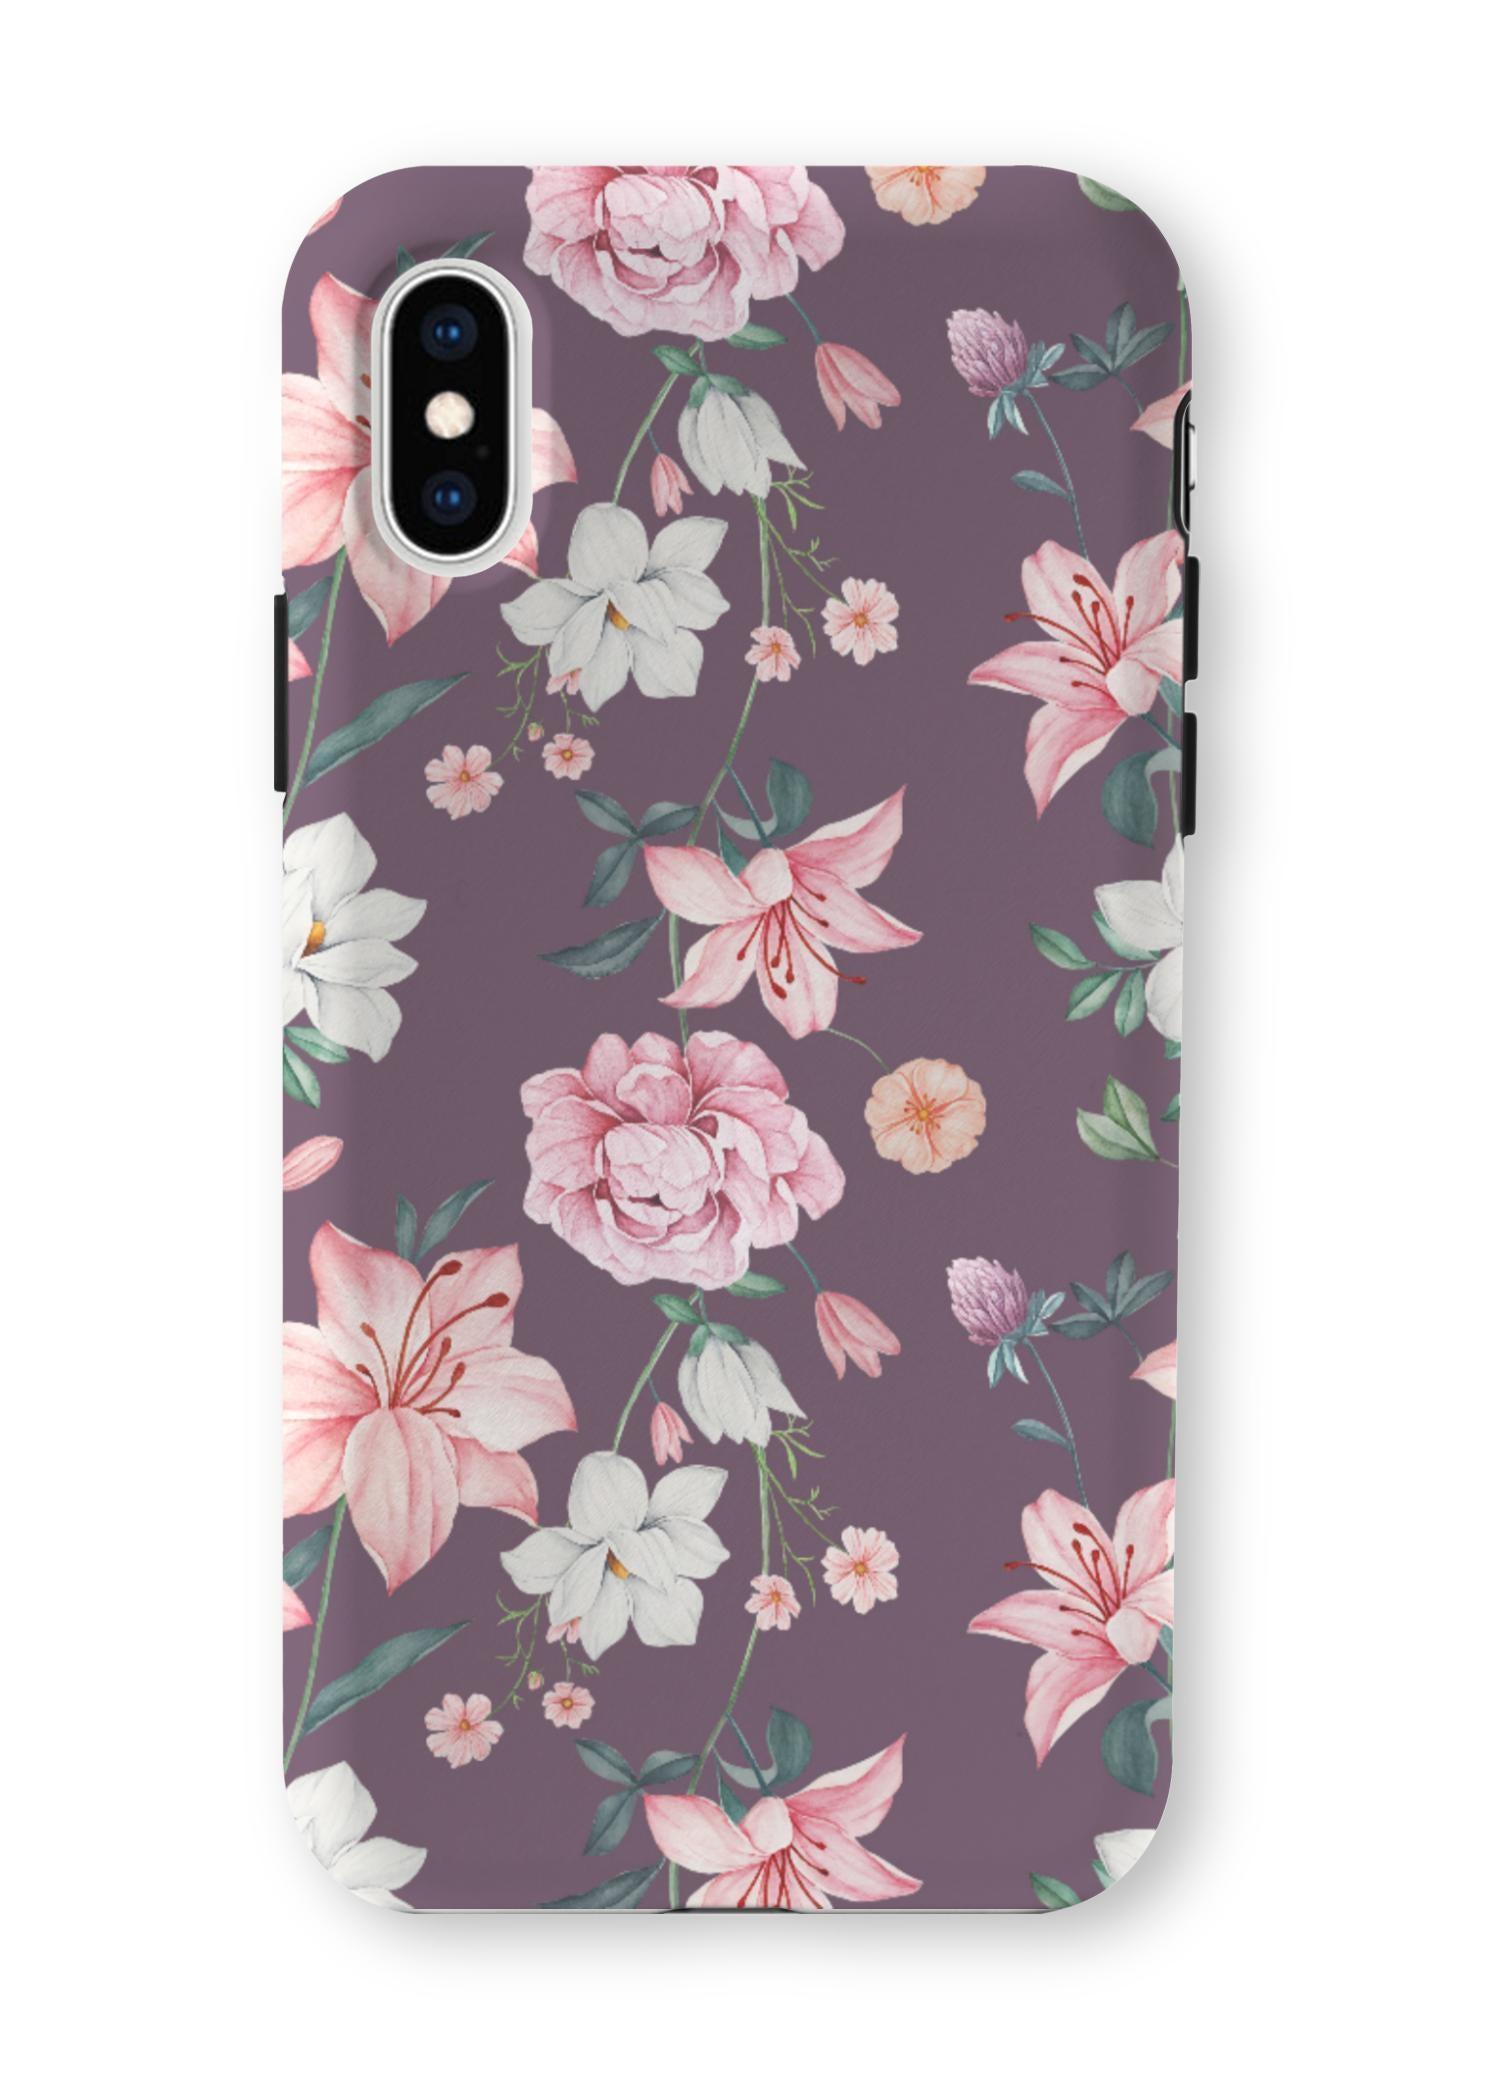 VIDA iPhone Case - Dauntless Garden by VIDA Original Artist  - Size: Extra Small